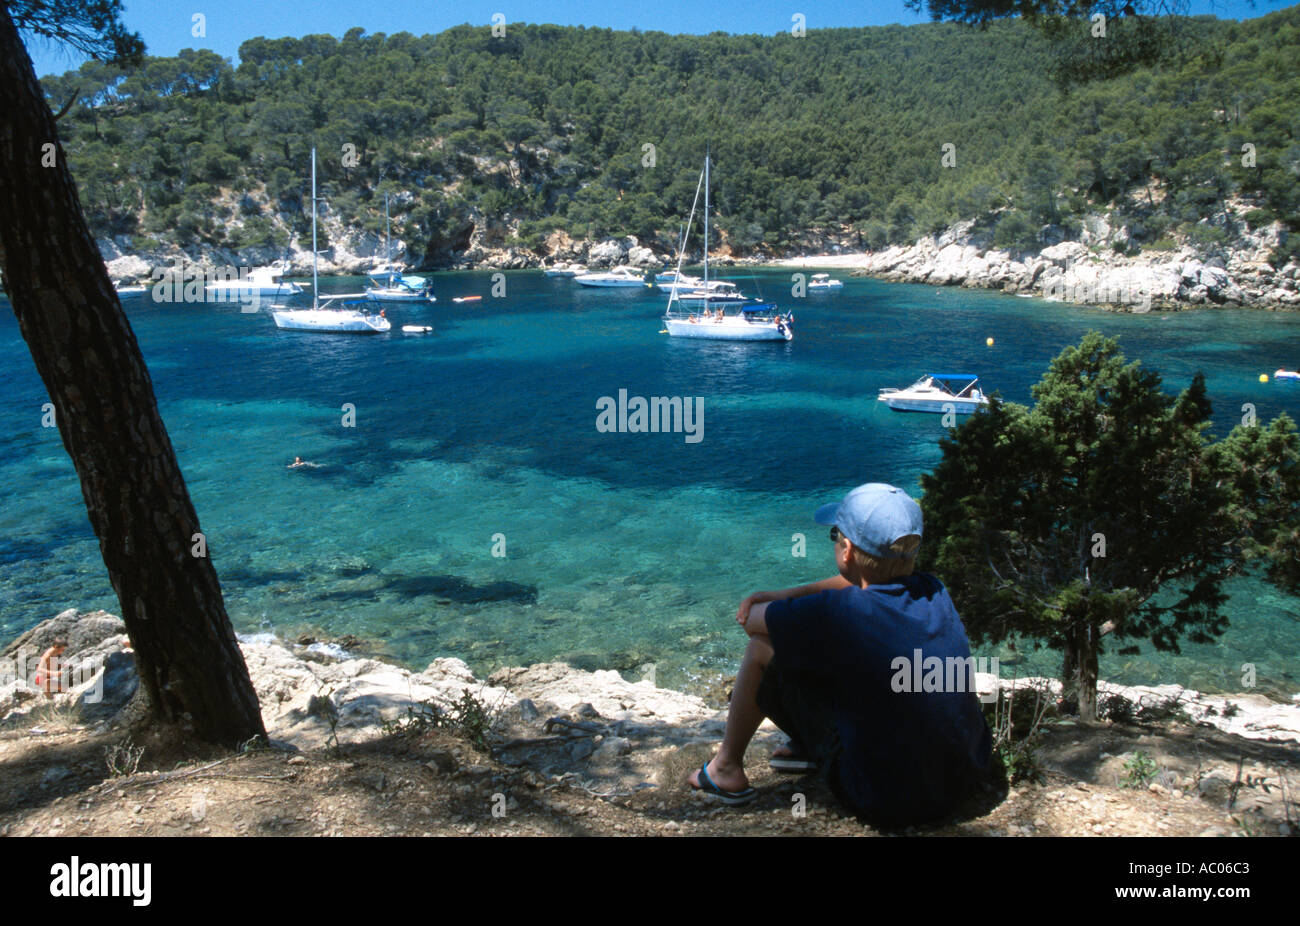 a boy looks out to sea over a picturequresque cove port d allon